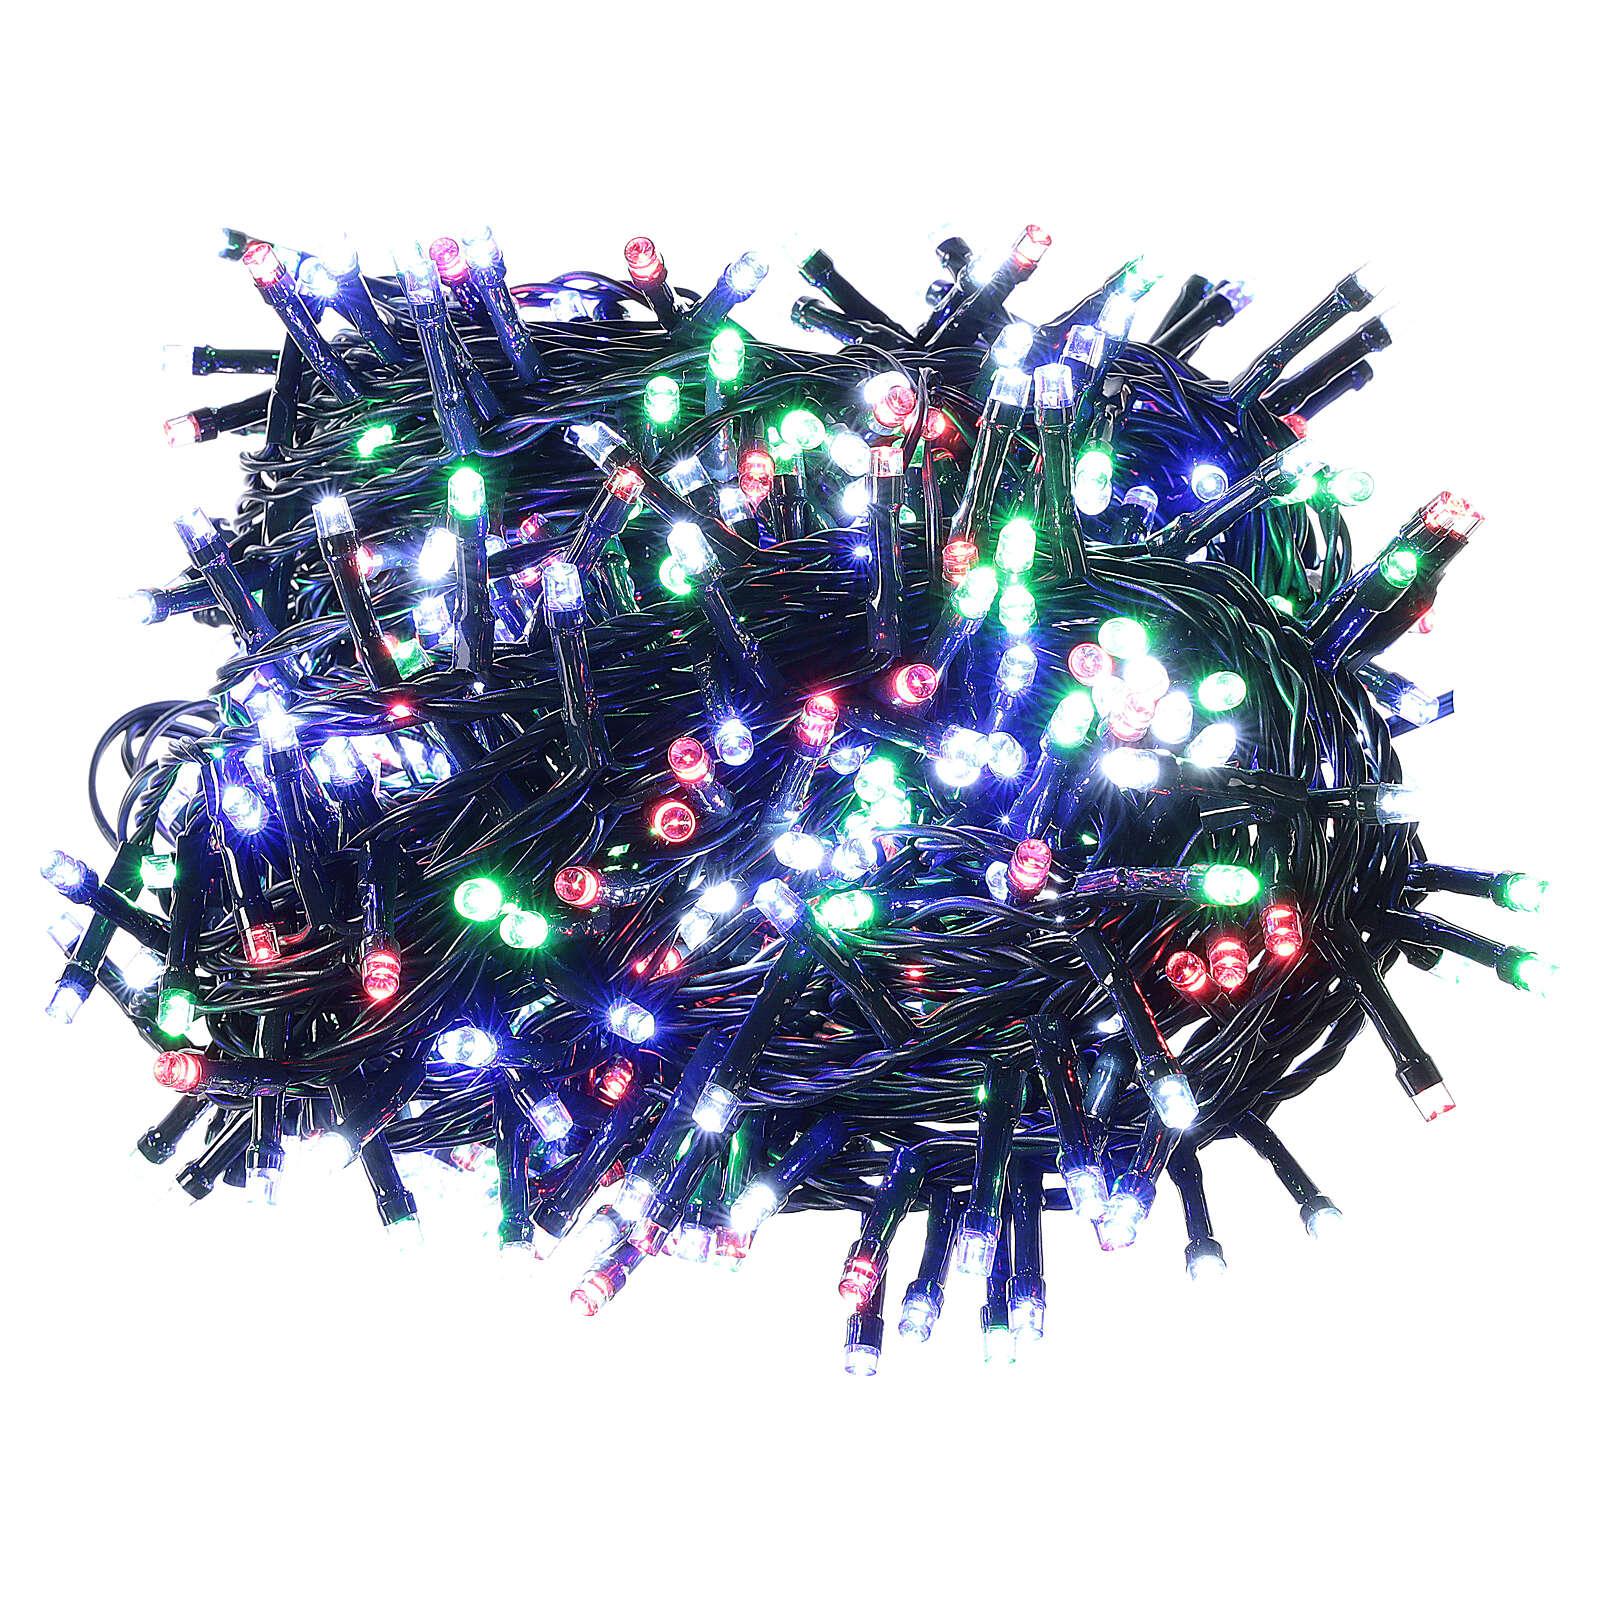 Multicolor Christmas tree lights, 500 LEDs green string outdoors 220V 3